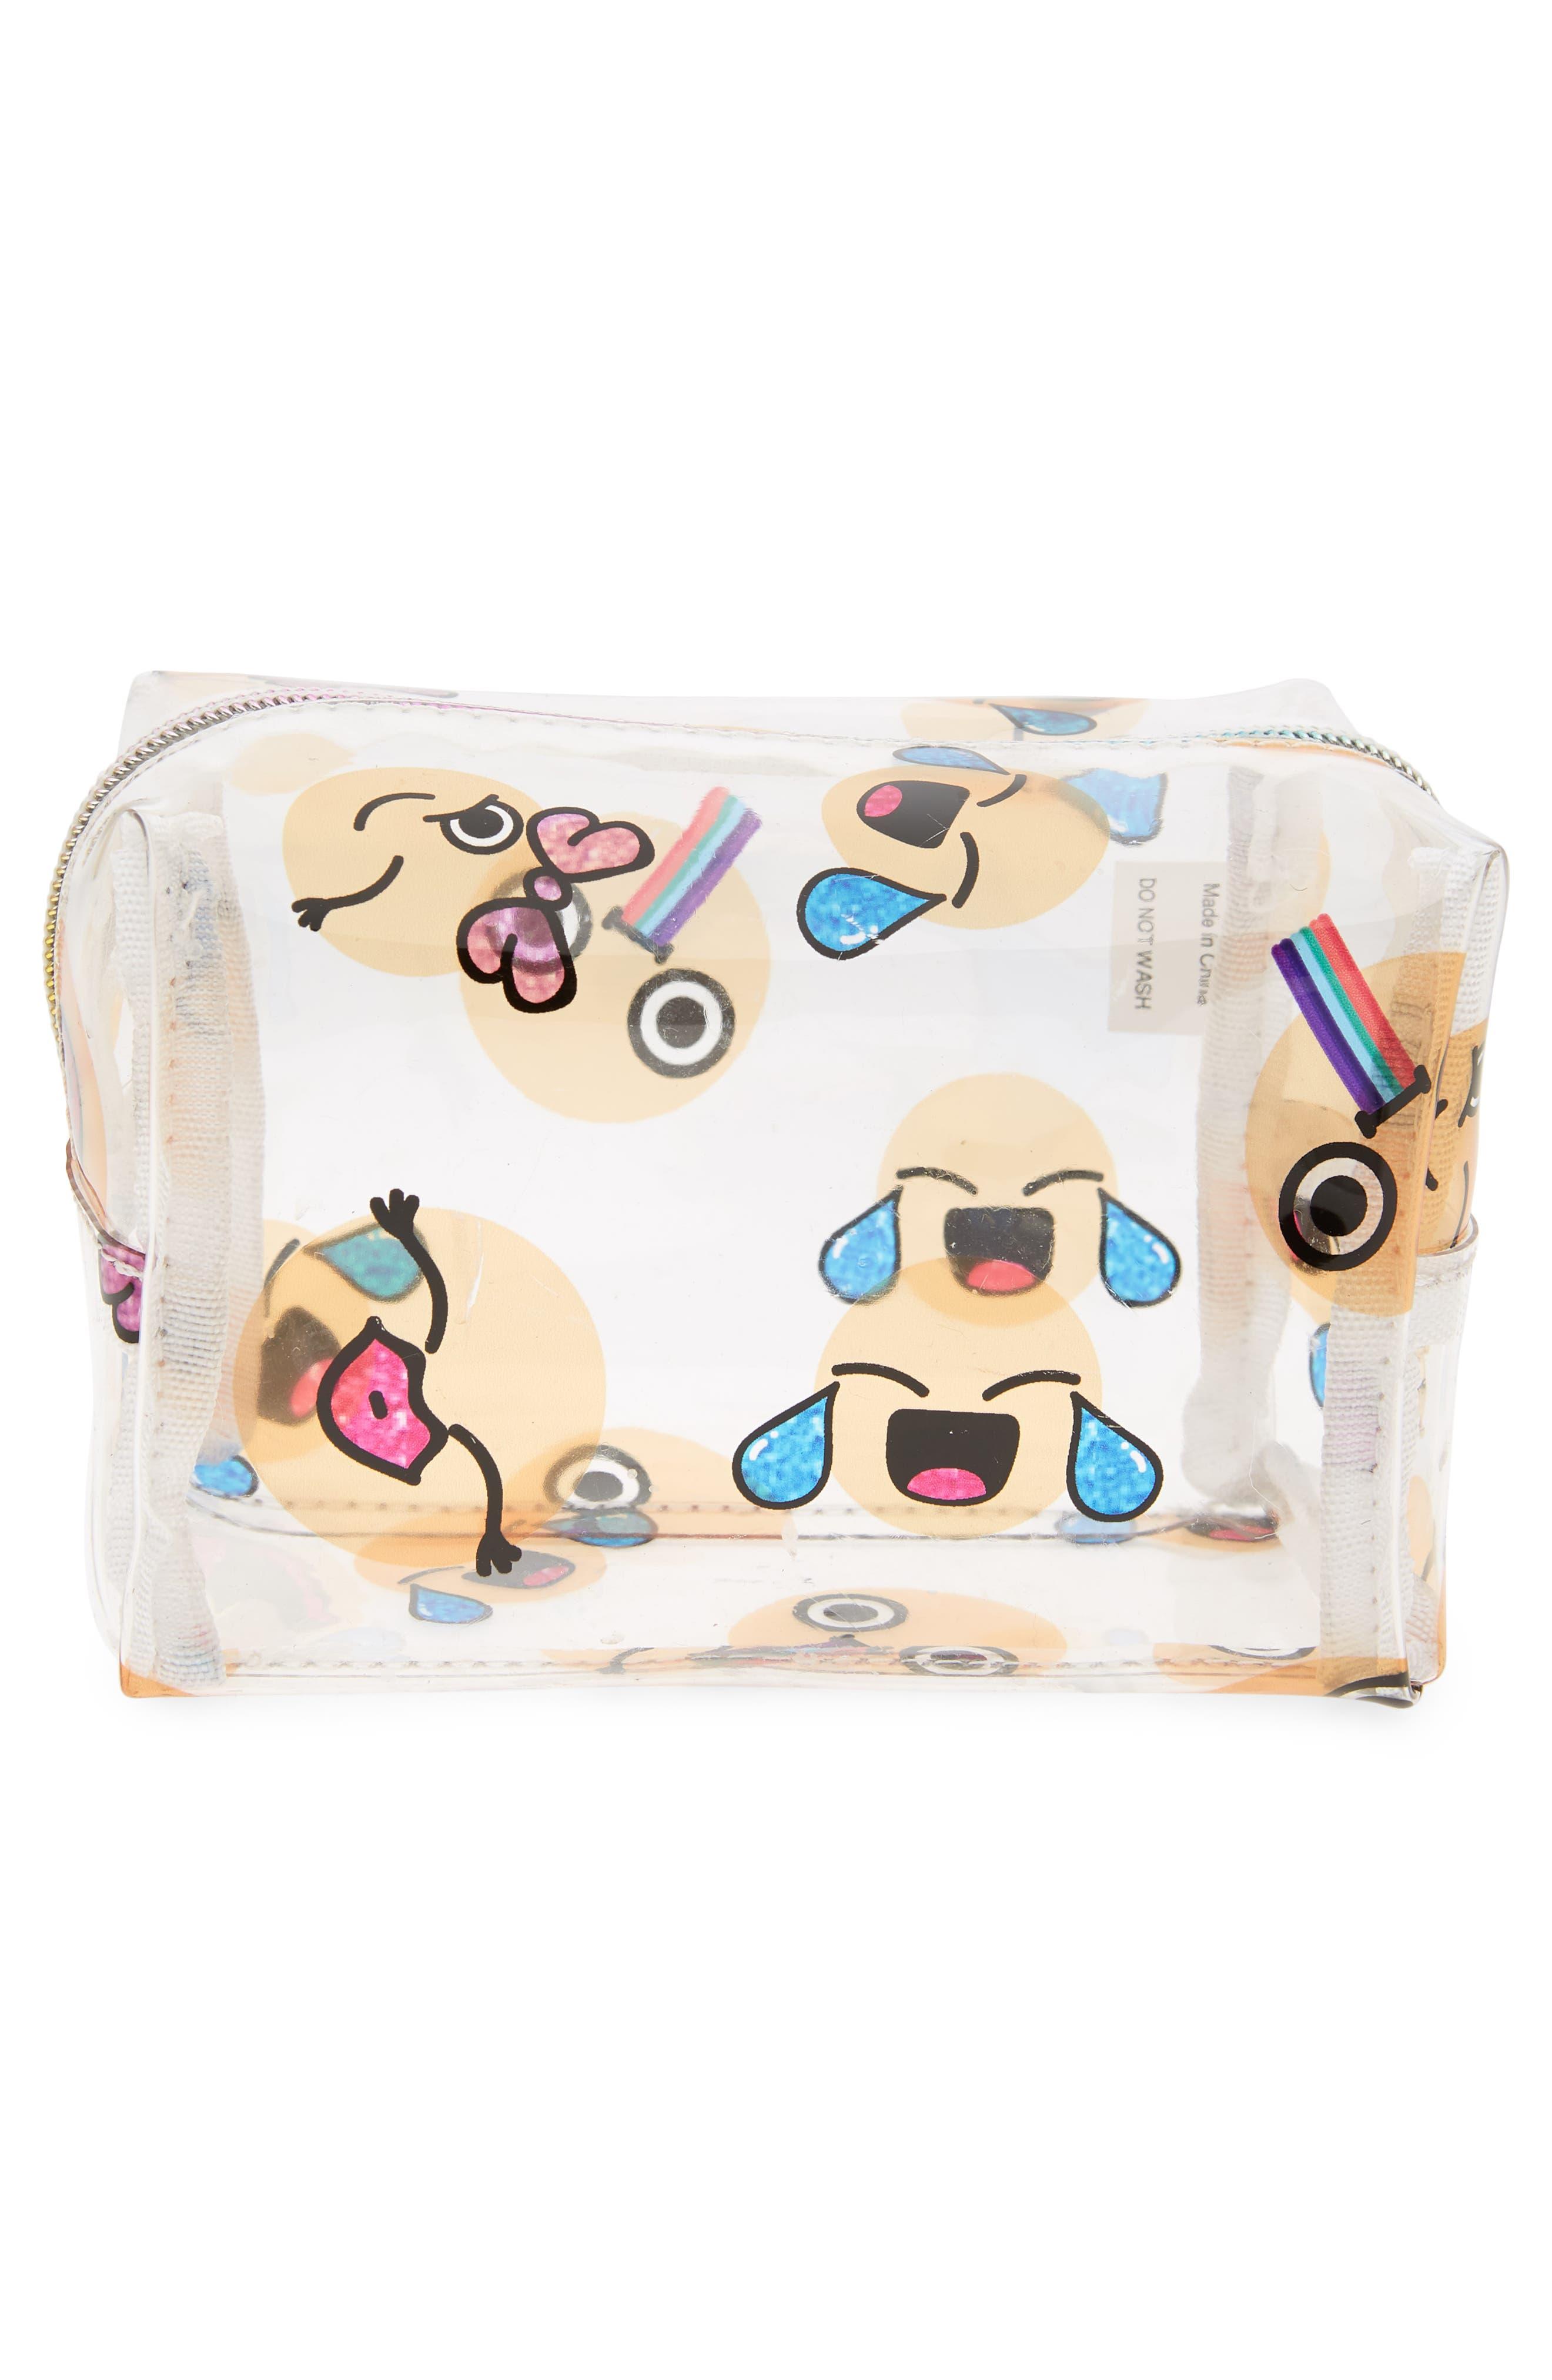 Emoji Cosmetics Case,                             Alternate thumbnail 2, color,                             100